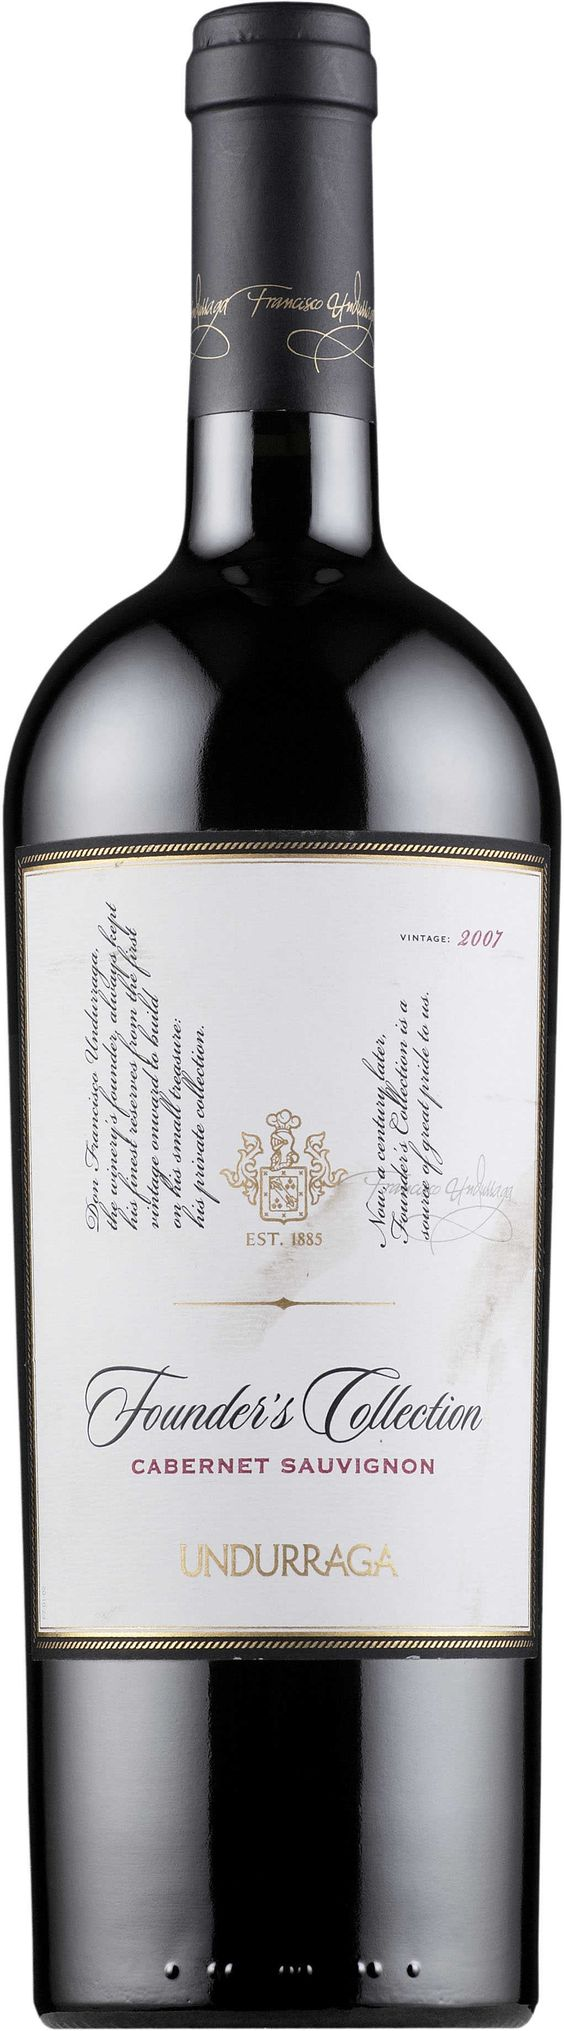 Kết quả hình ảnh cho undurraga founder collection cabernet sauvignon